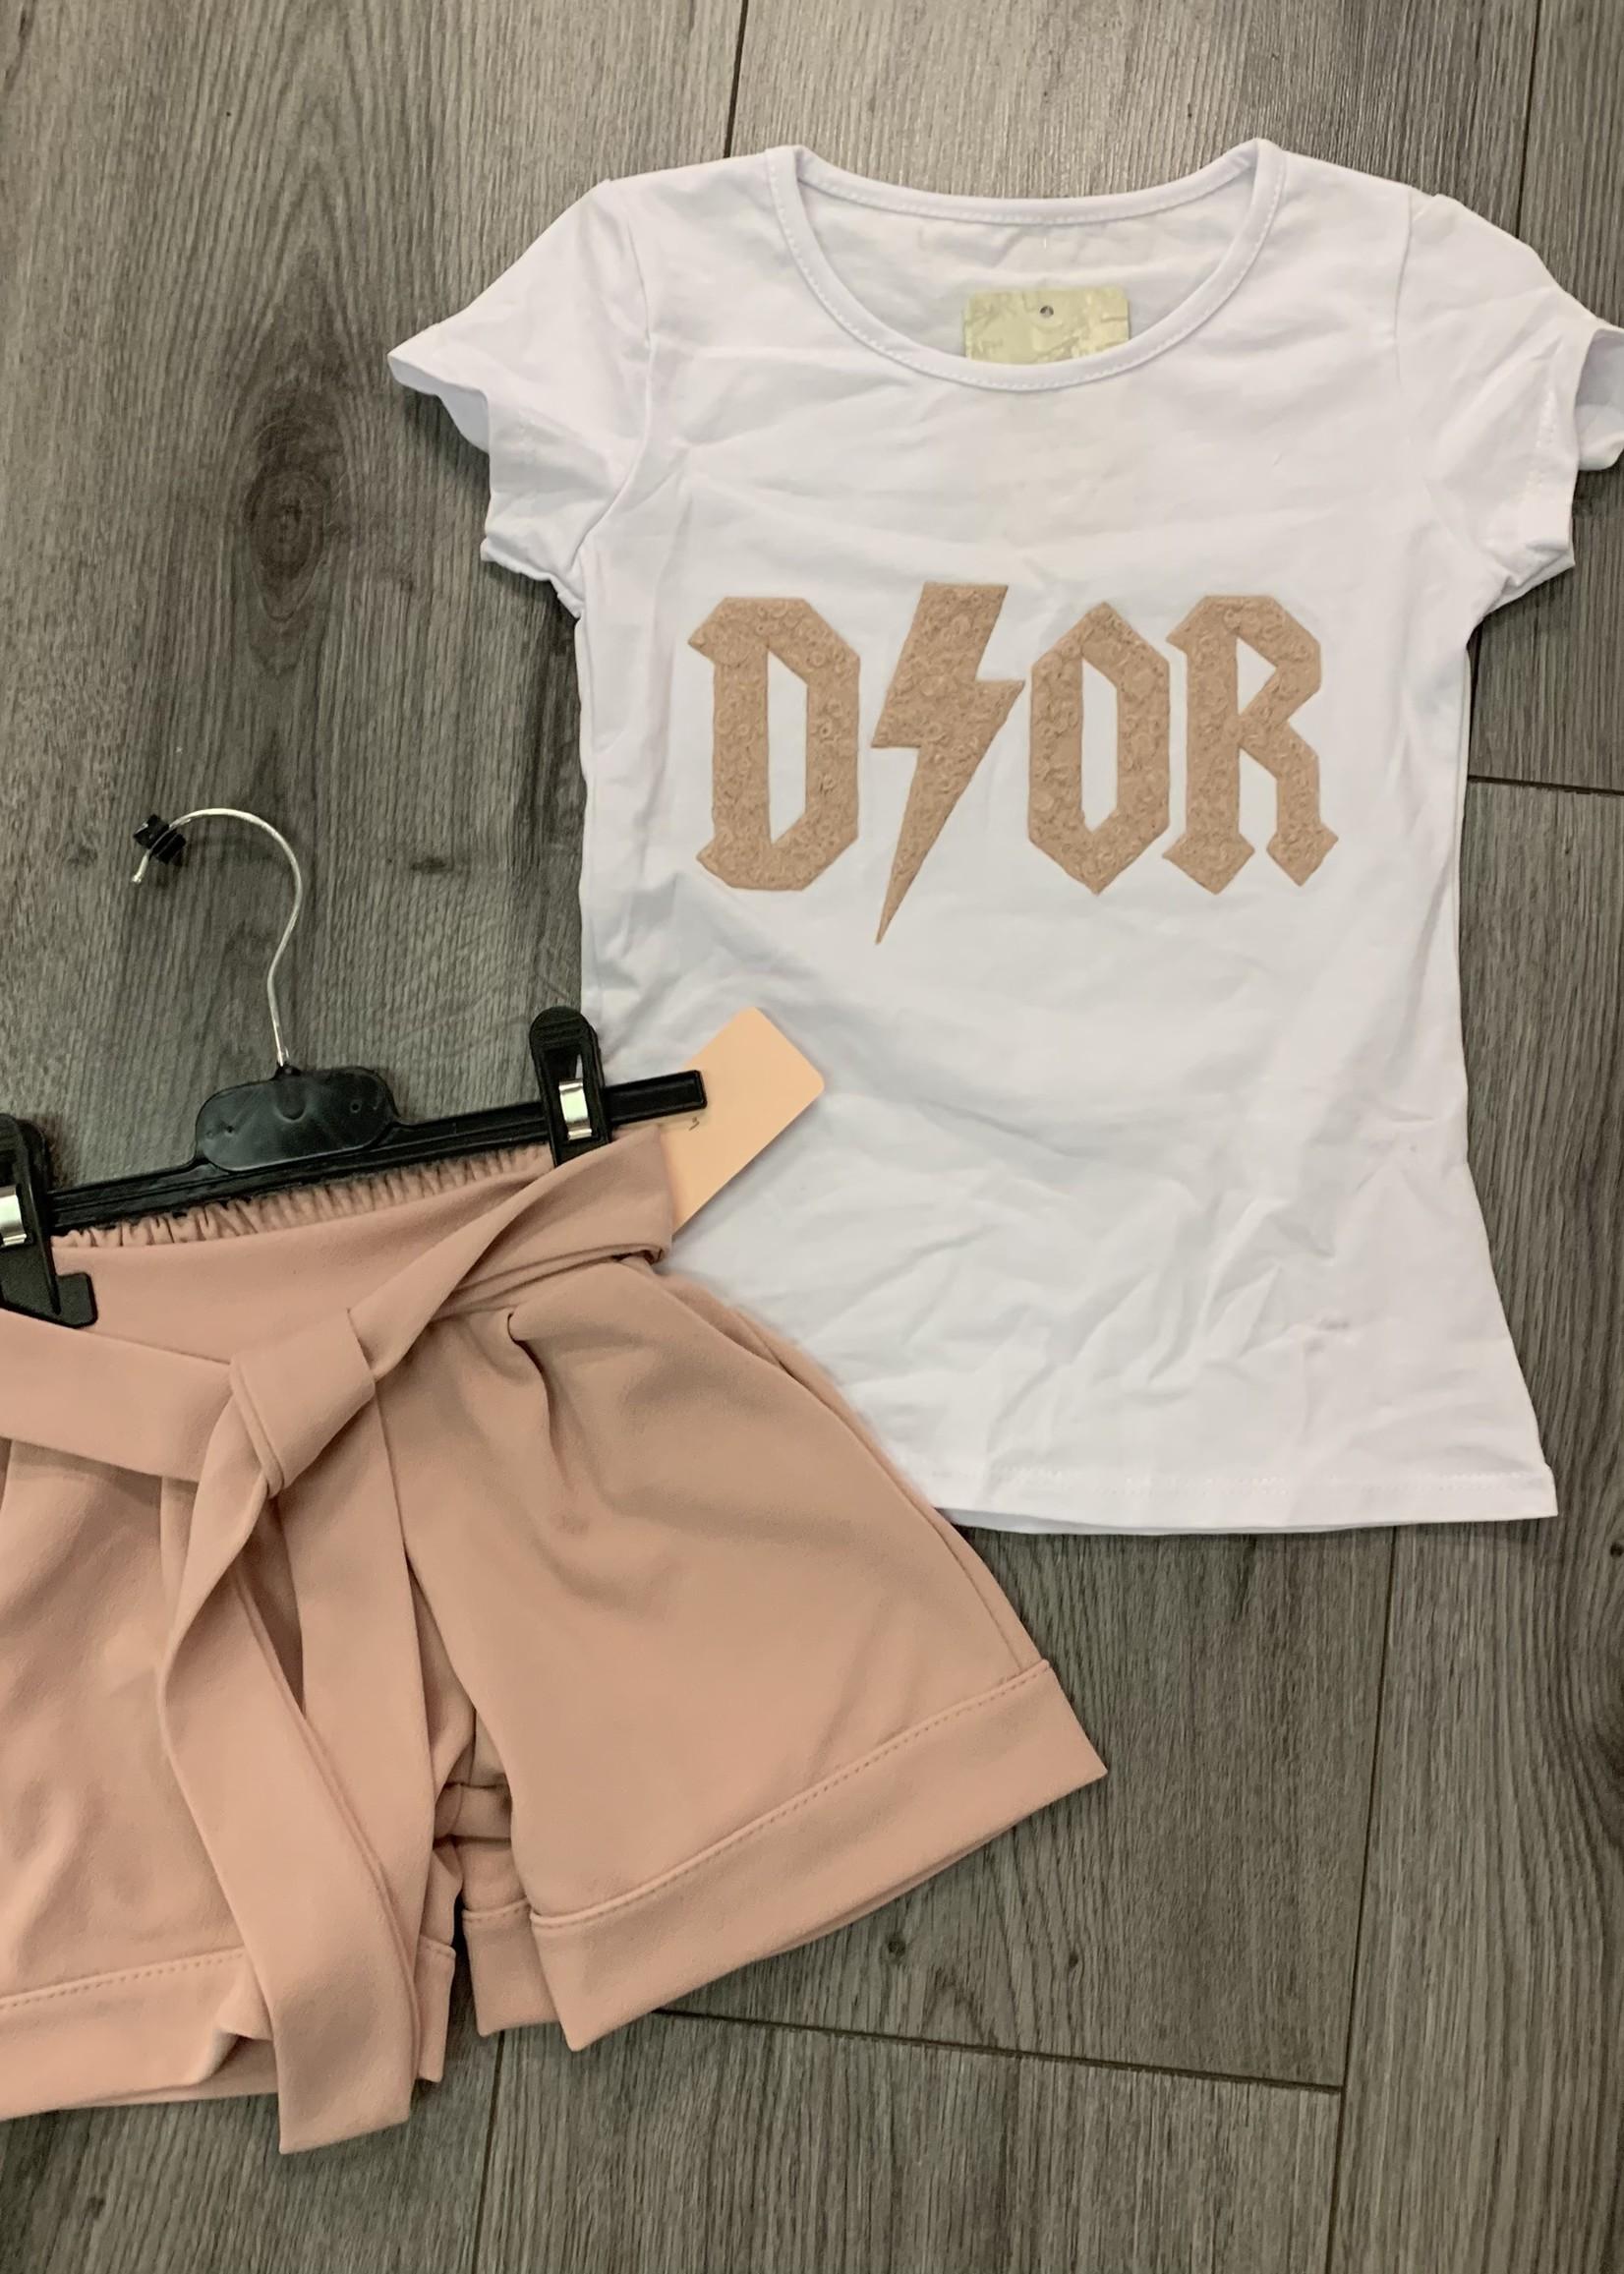 Divanis Divanis dior tshirt zalmkleur letters